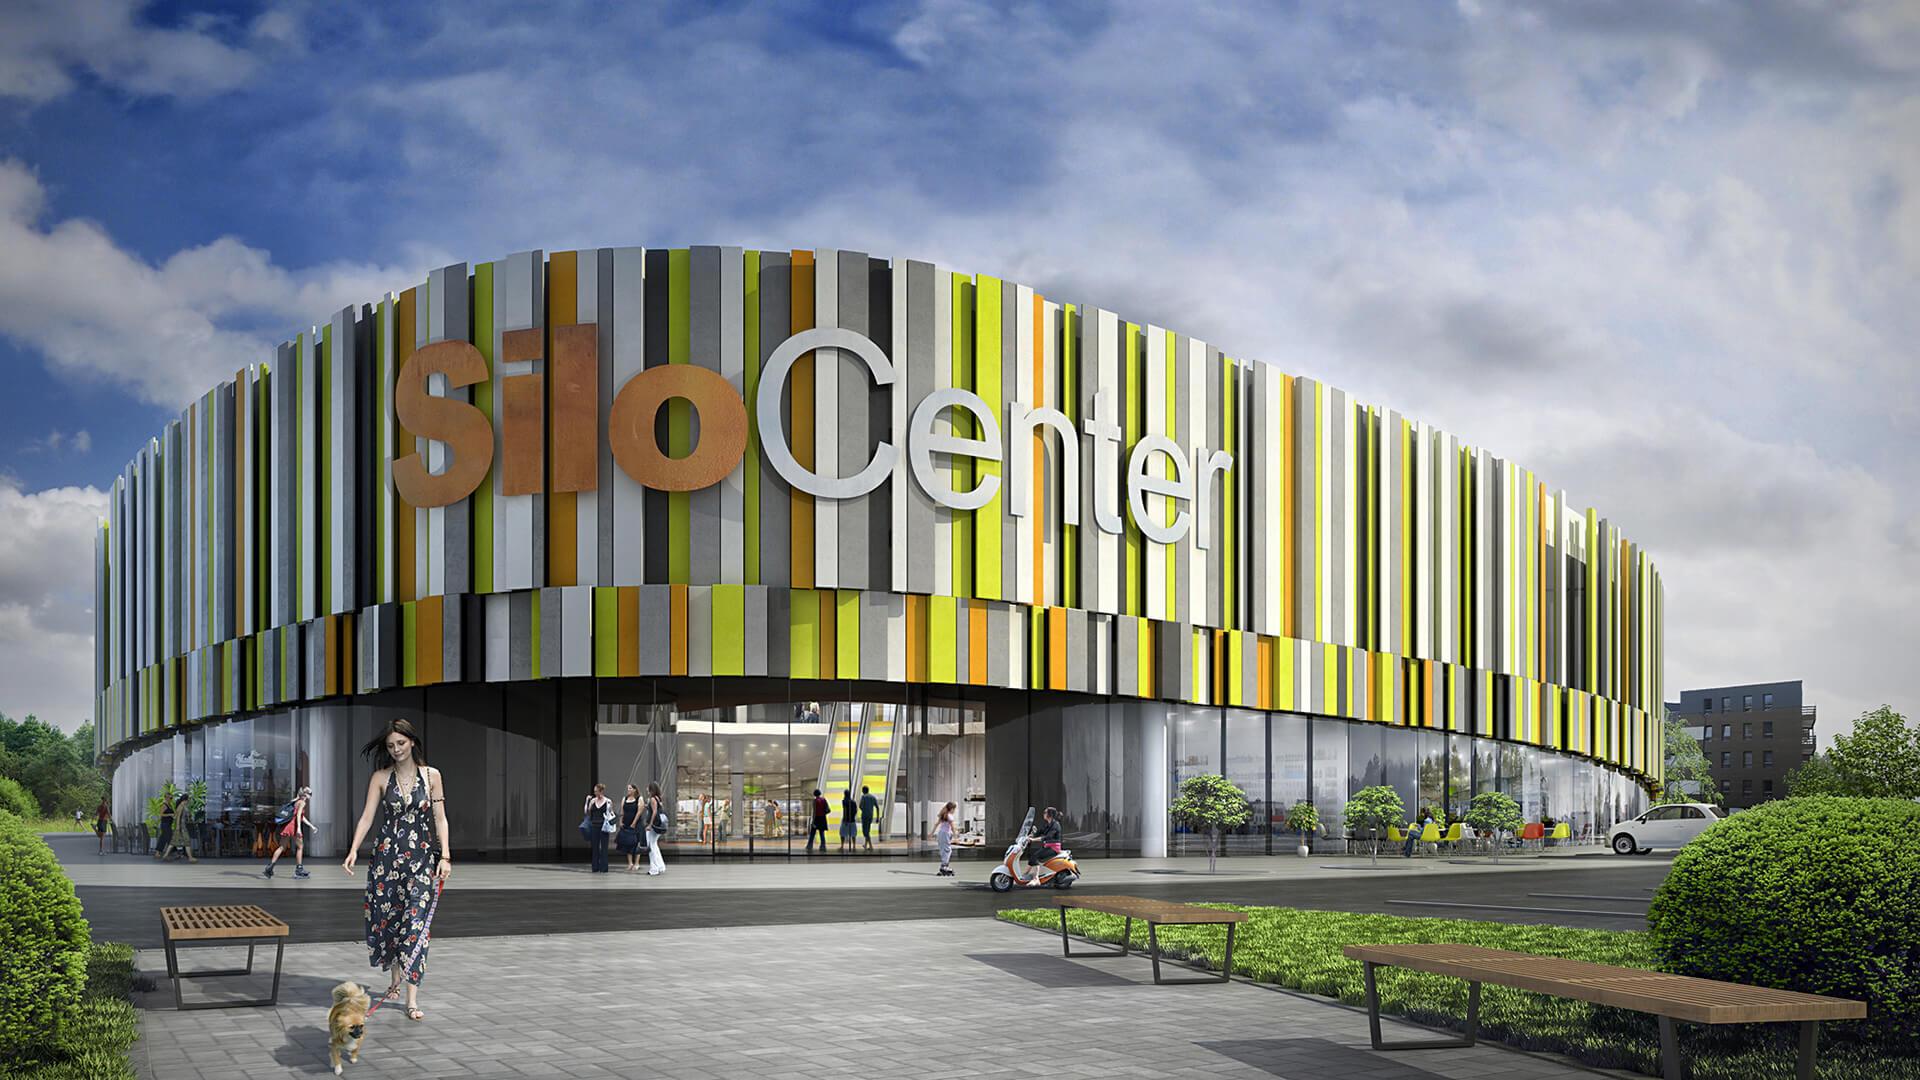 SiloCenter Centrum Sportowo - Rekreacyjne - Projekt Neostudio Architekci